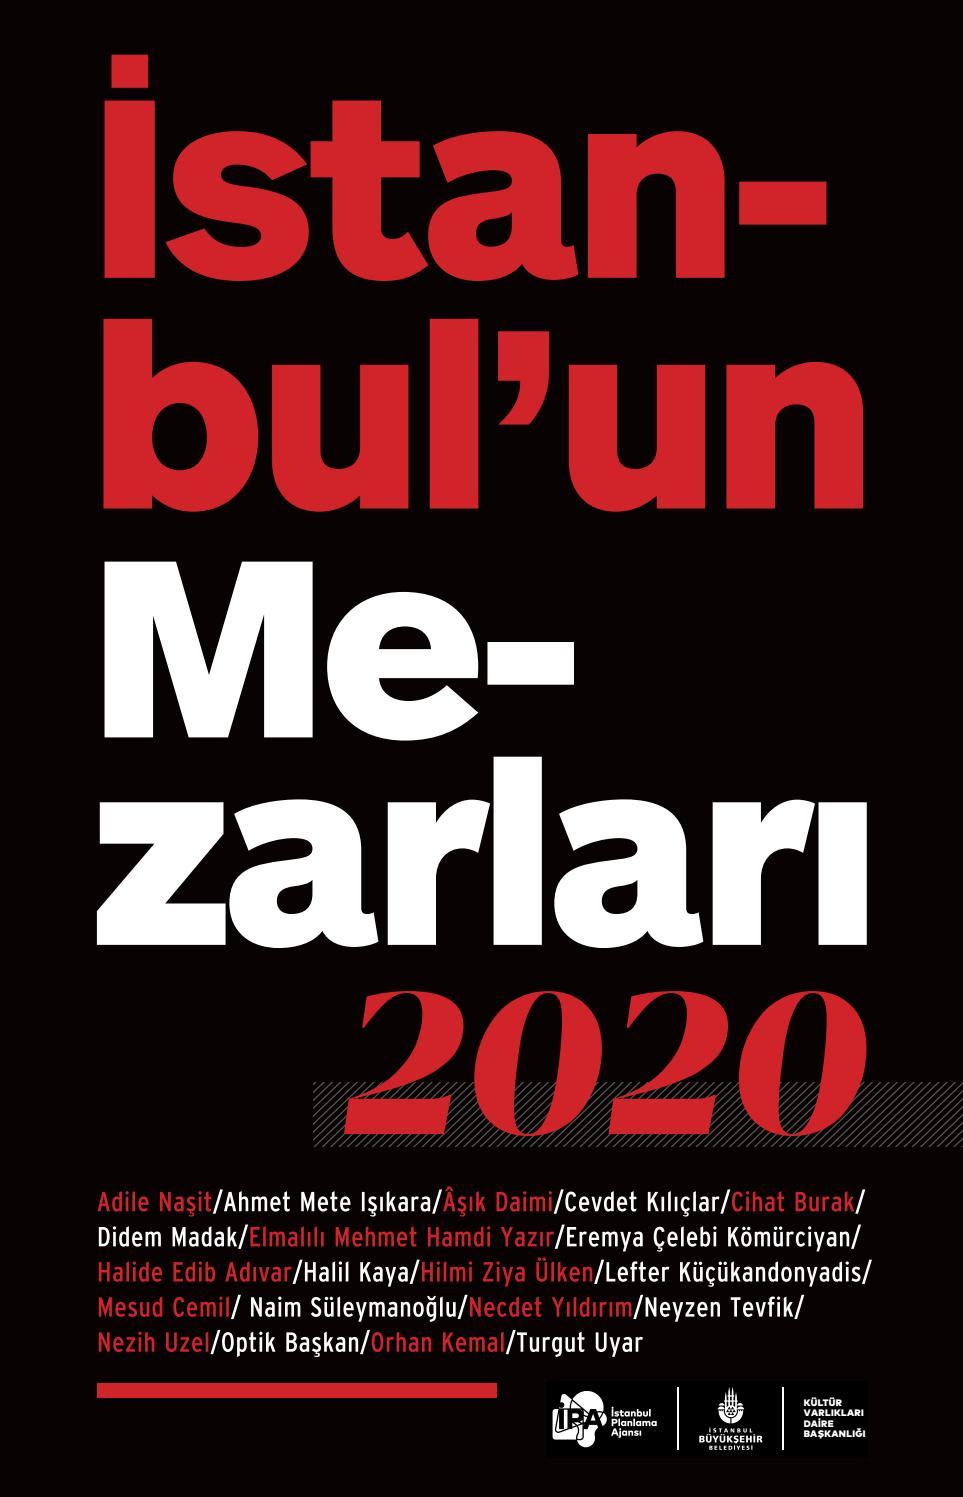 istanbul un mezarlari 2020 by